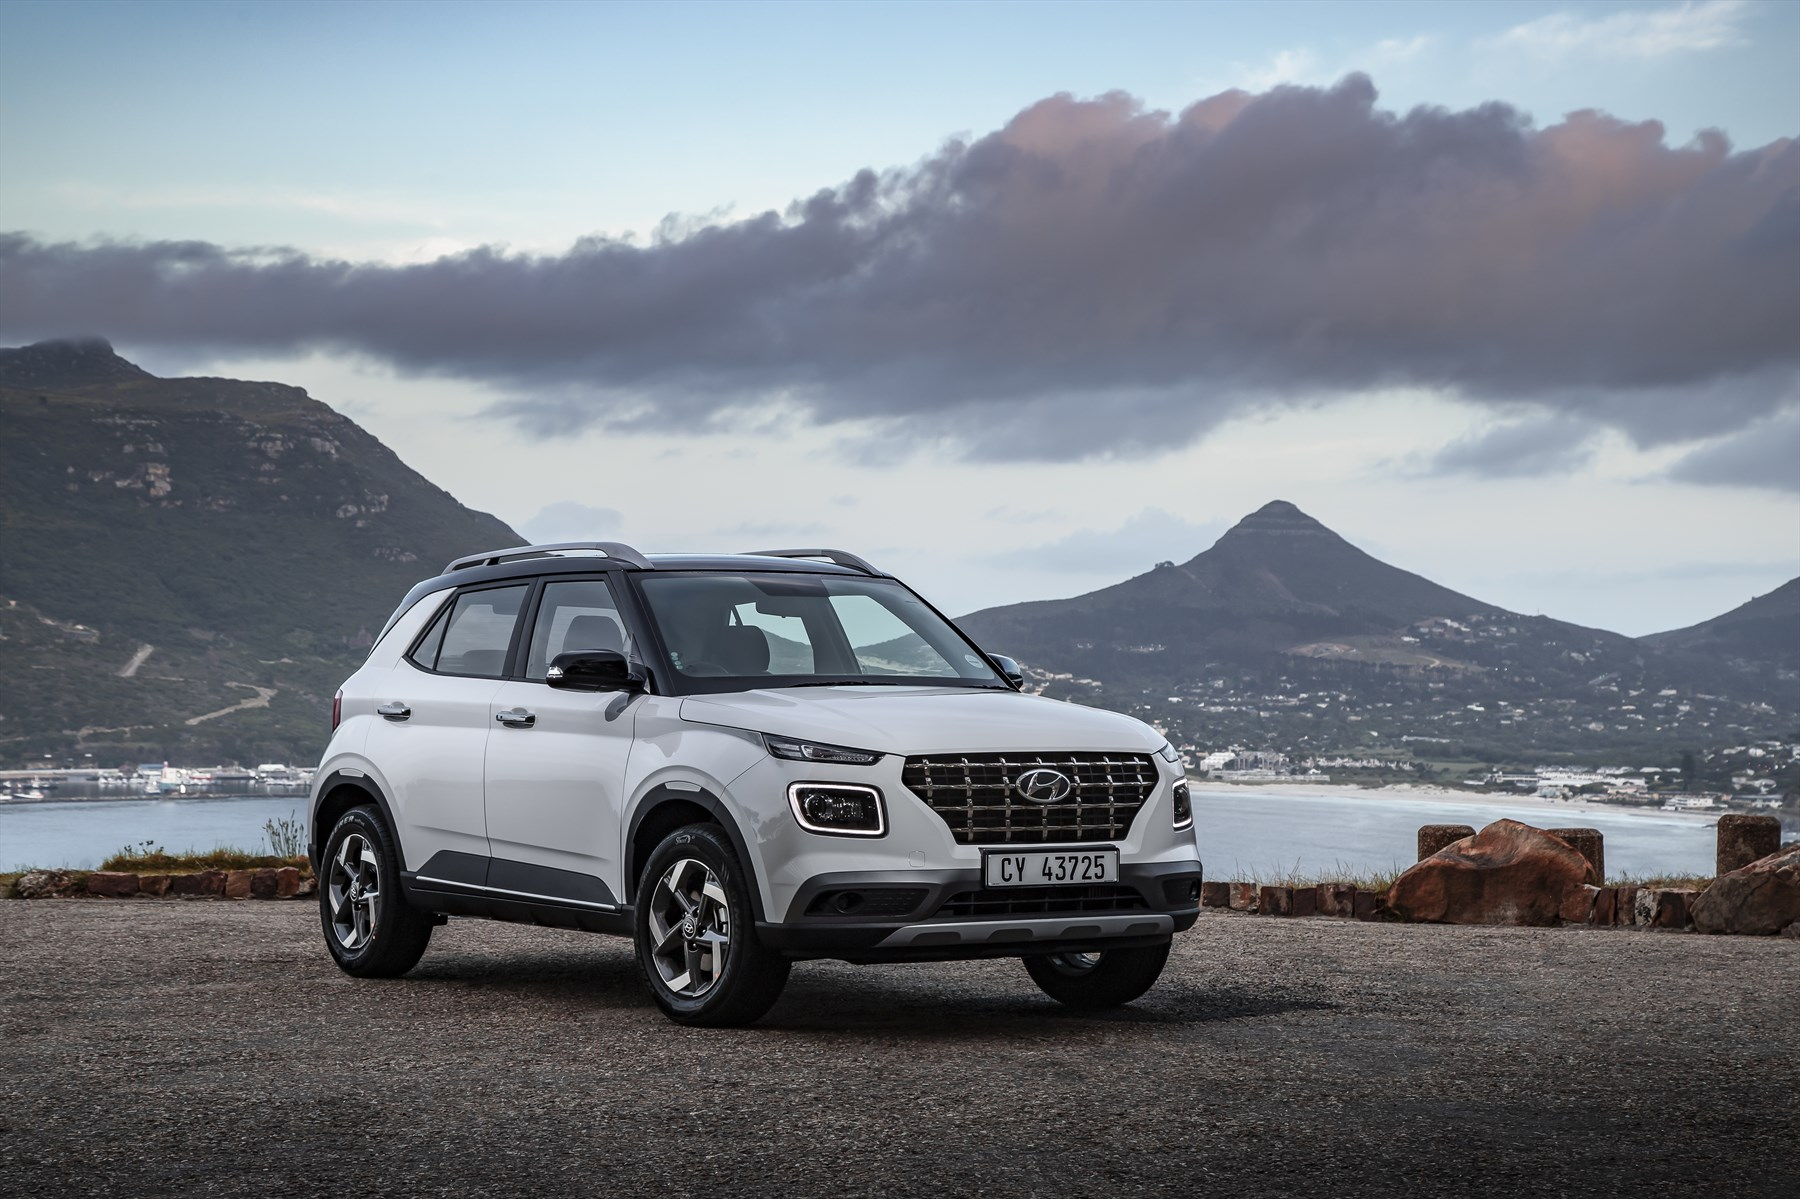 Hyundai Venue | compact SUV